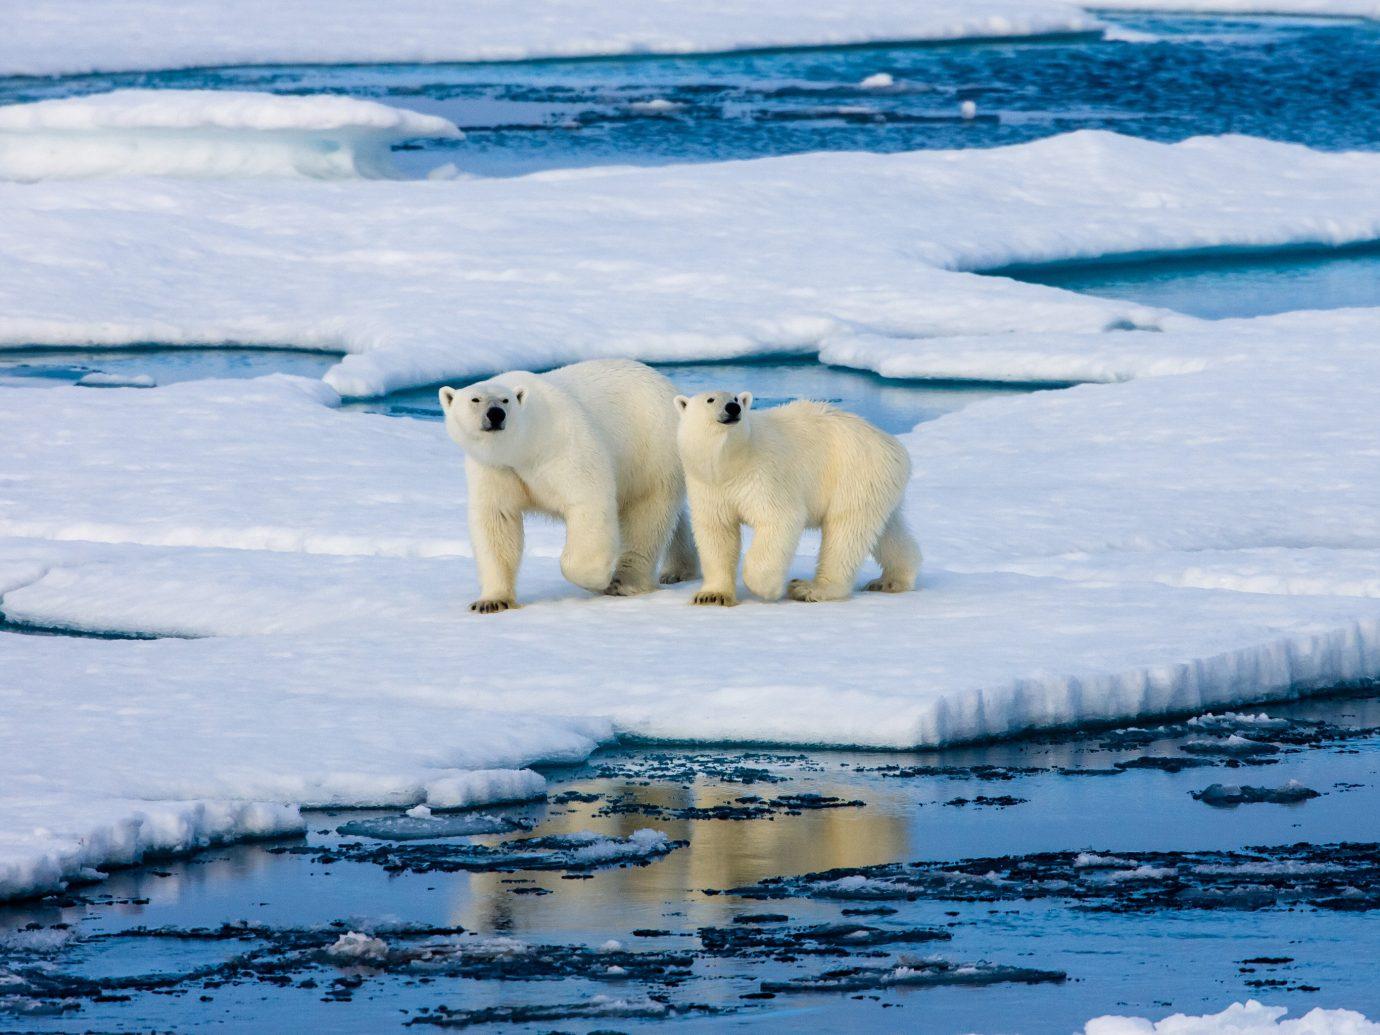 Adventure Trip Ideas water polar outdoor polar bear arctic ocean animal arctic bear mammal polar ice cap ice ice cap melting tundra Wildlife carnivoran sea ice Ocean freezing glacial landform swimming